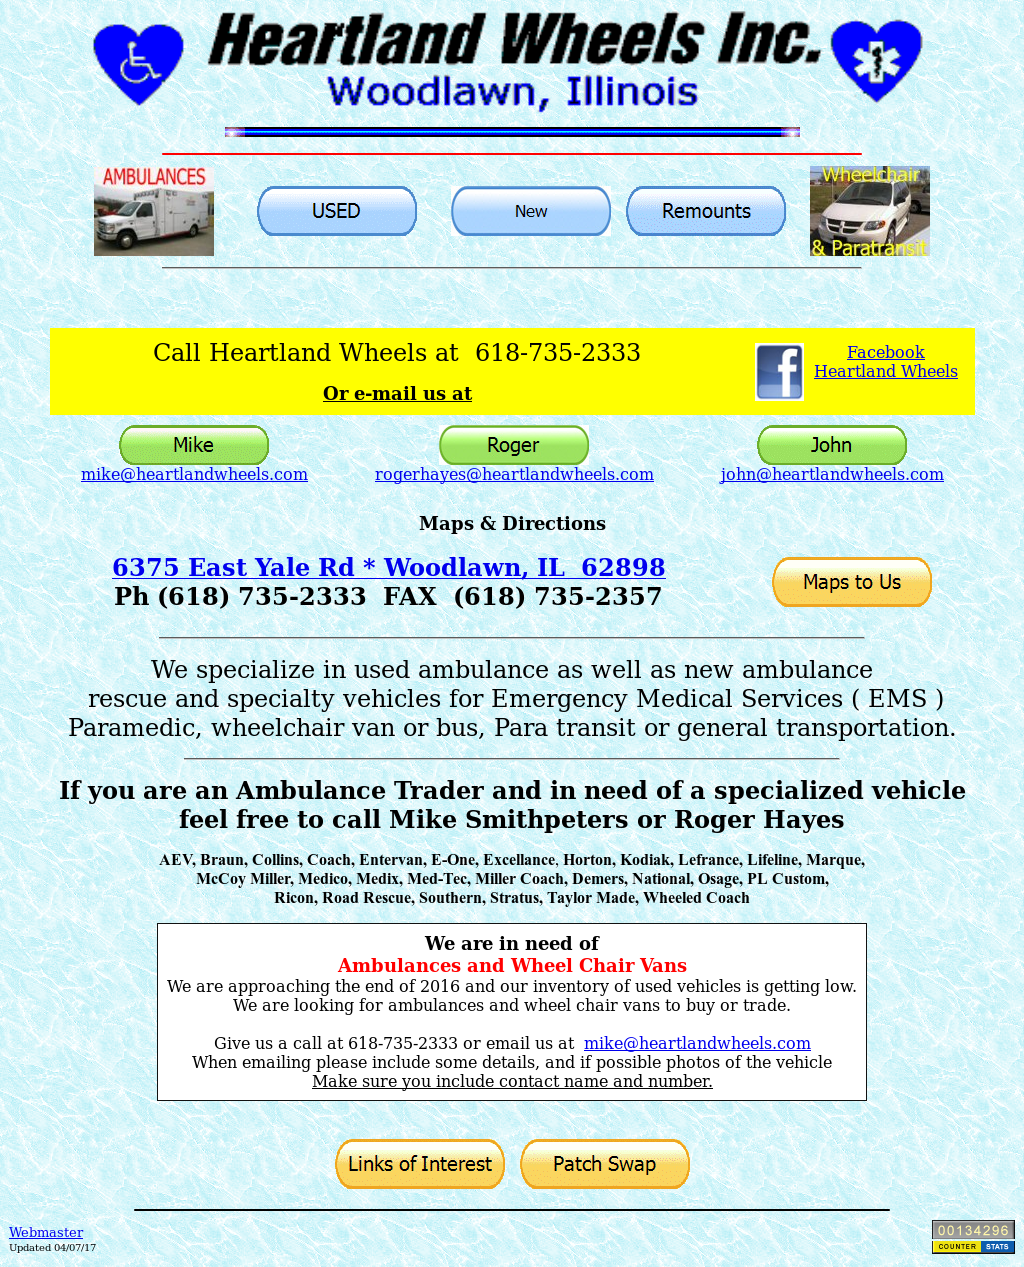 Heartland Wheels Inc  - Ambulance Sales Competitors, Revenue